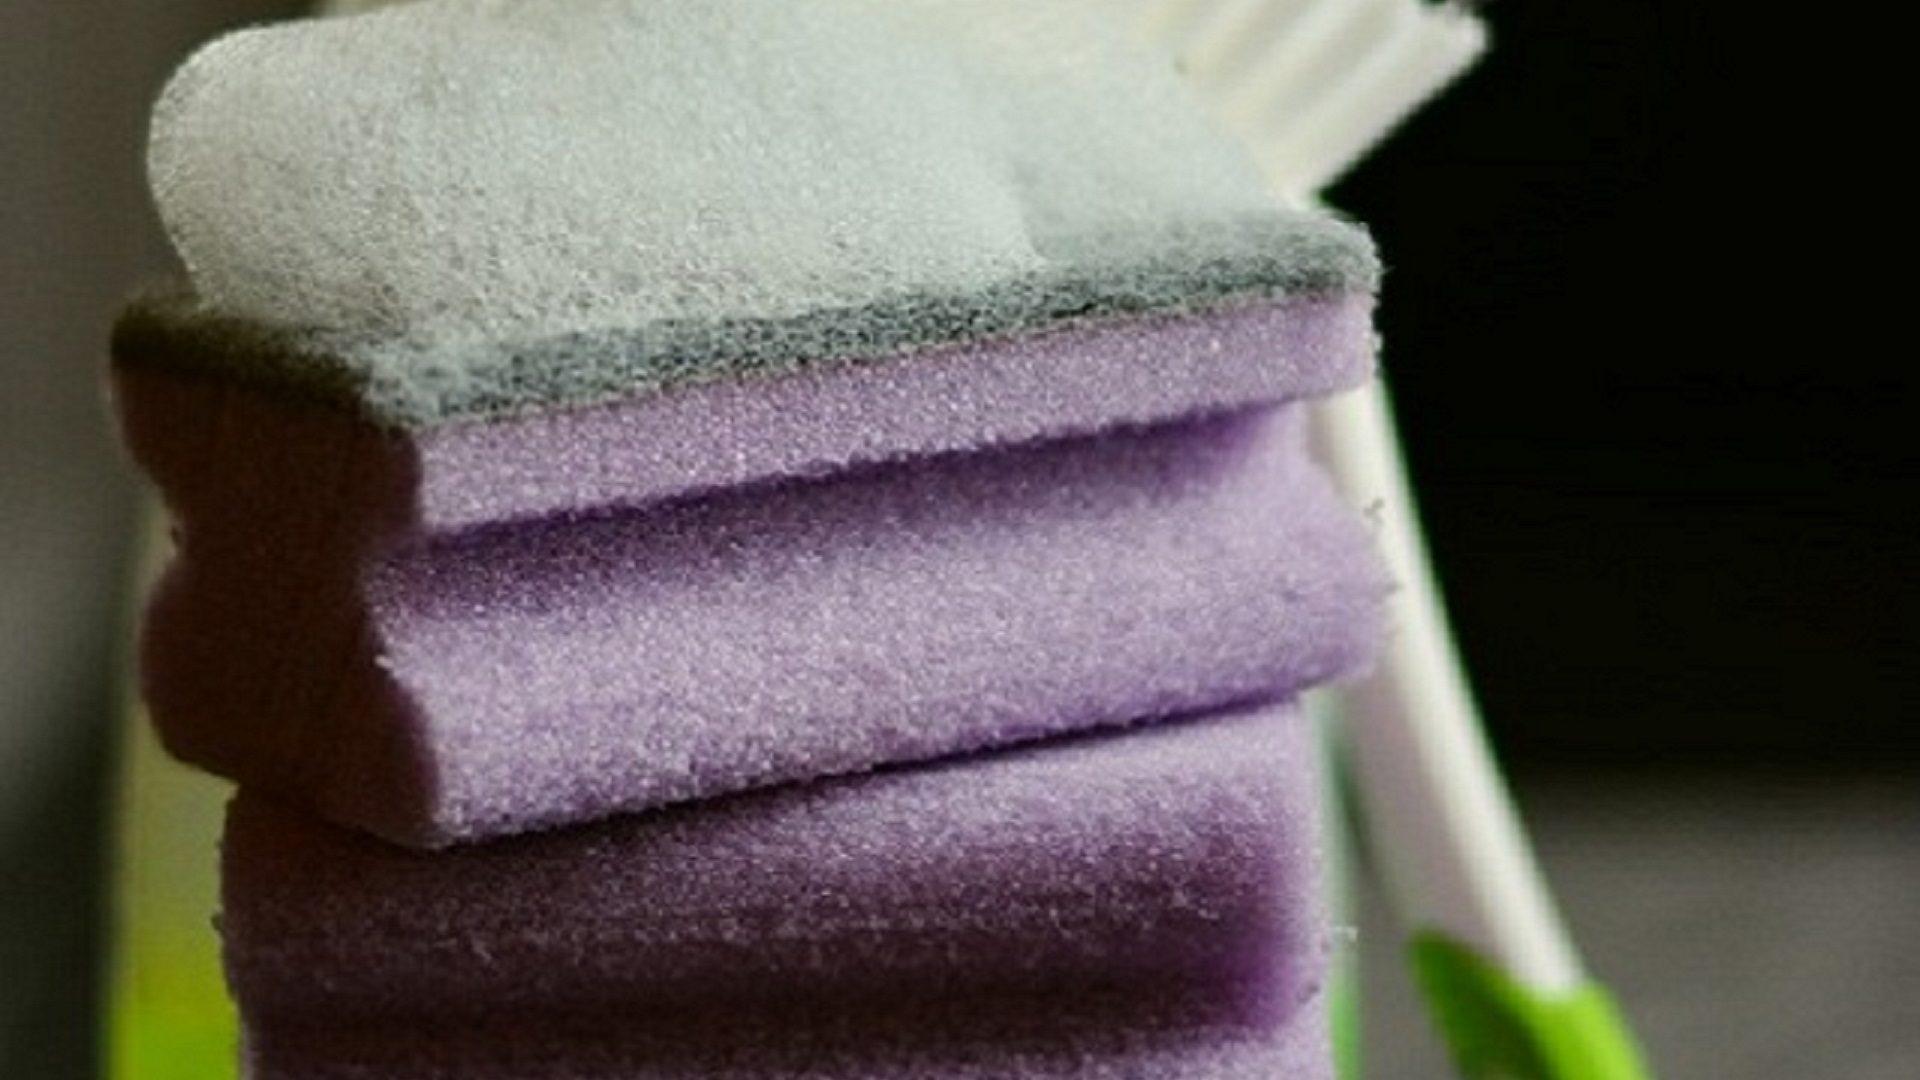 Spugne da cucina: i rimedi per sterilizzarle e liberarle da germi e batteri